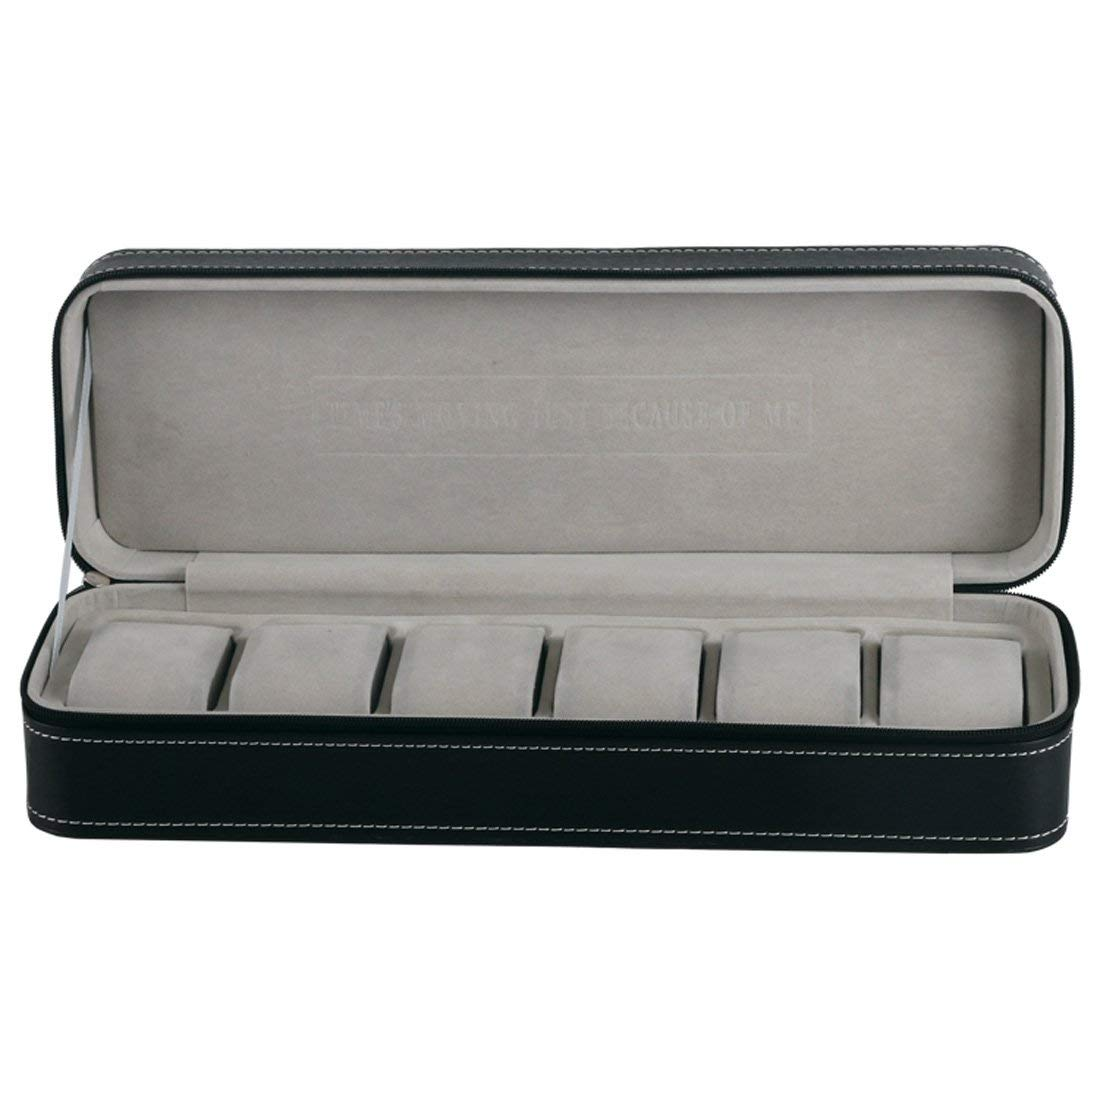 6 Slot Watch Box Portable Travel Zipper Case Collector Storage Jewelry Storage Box(Black)